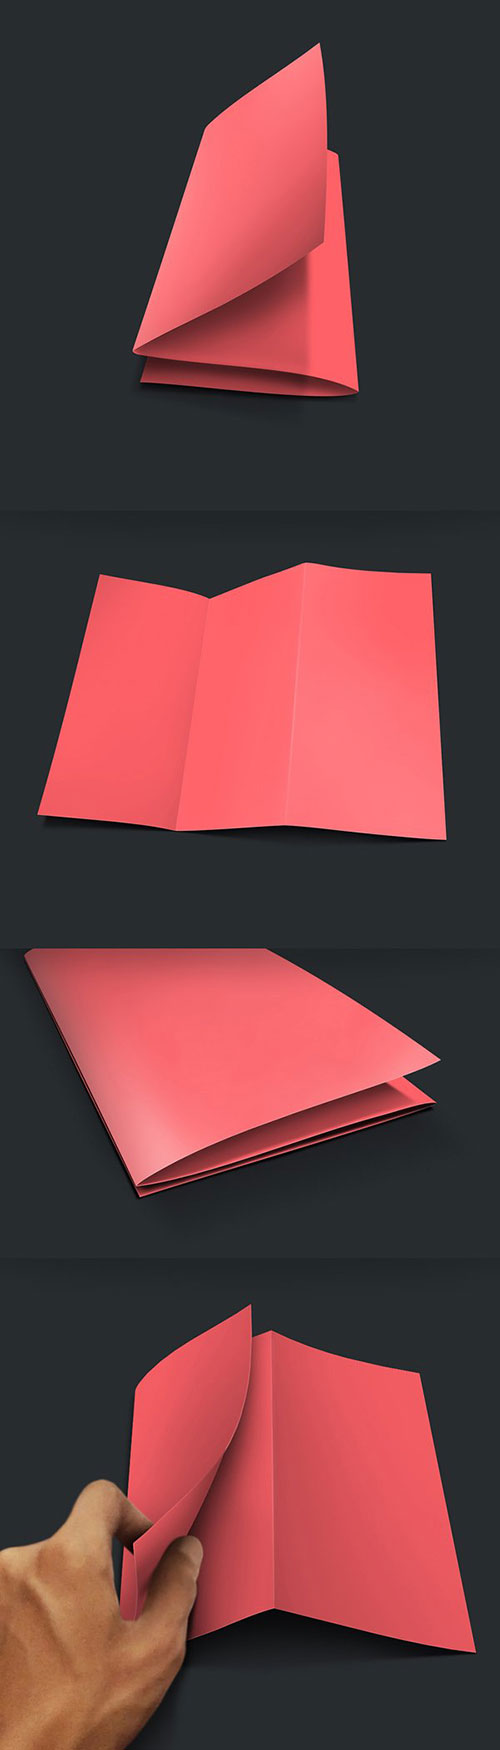 Free Z Fold Brochure Mockup PSD